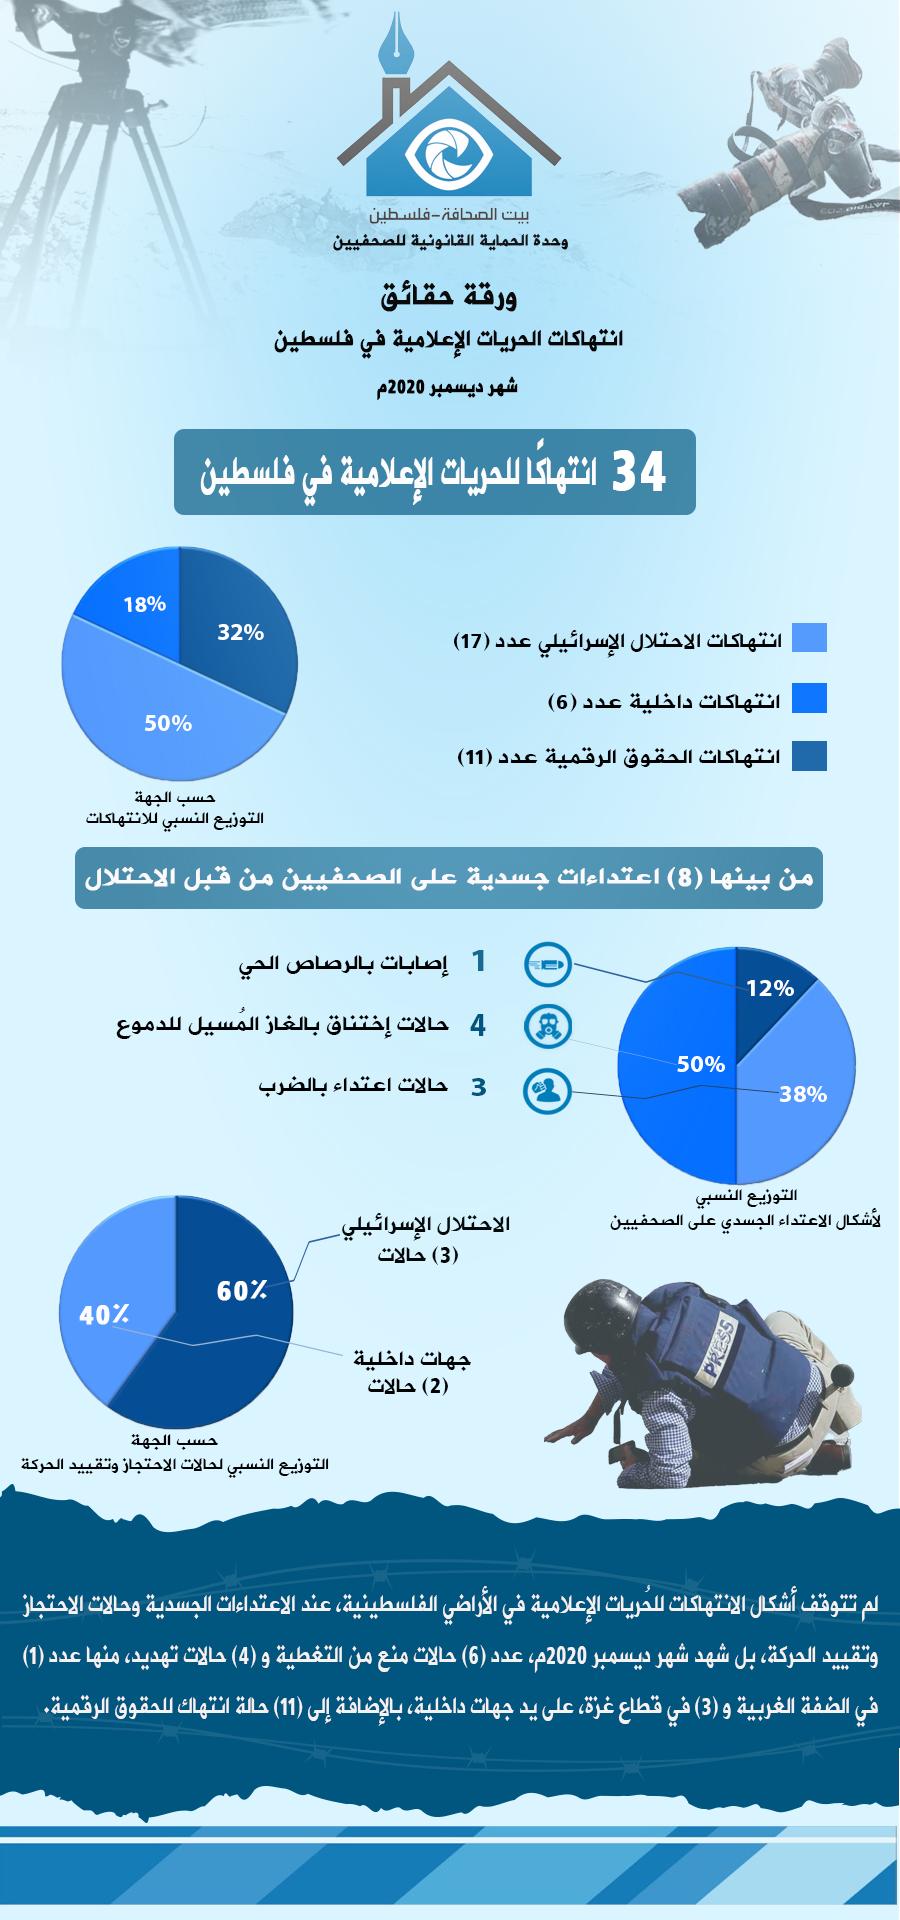 ورقة حقائق شهر 12 ديسمبر - عربي.png